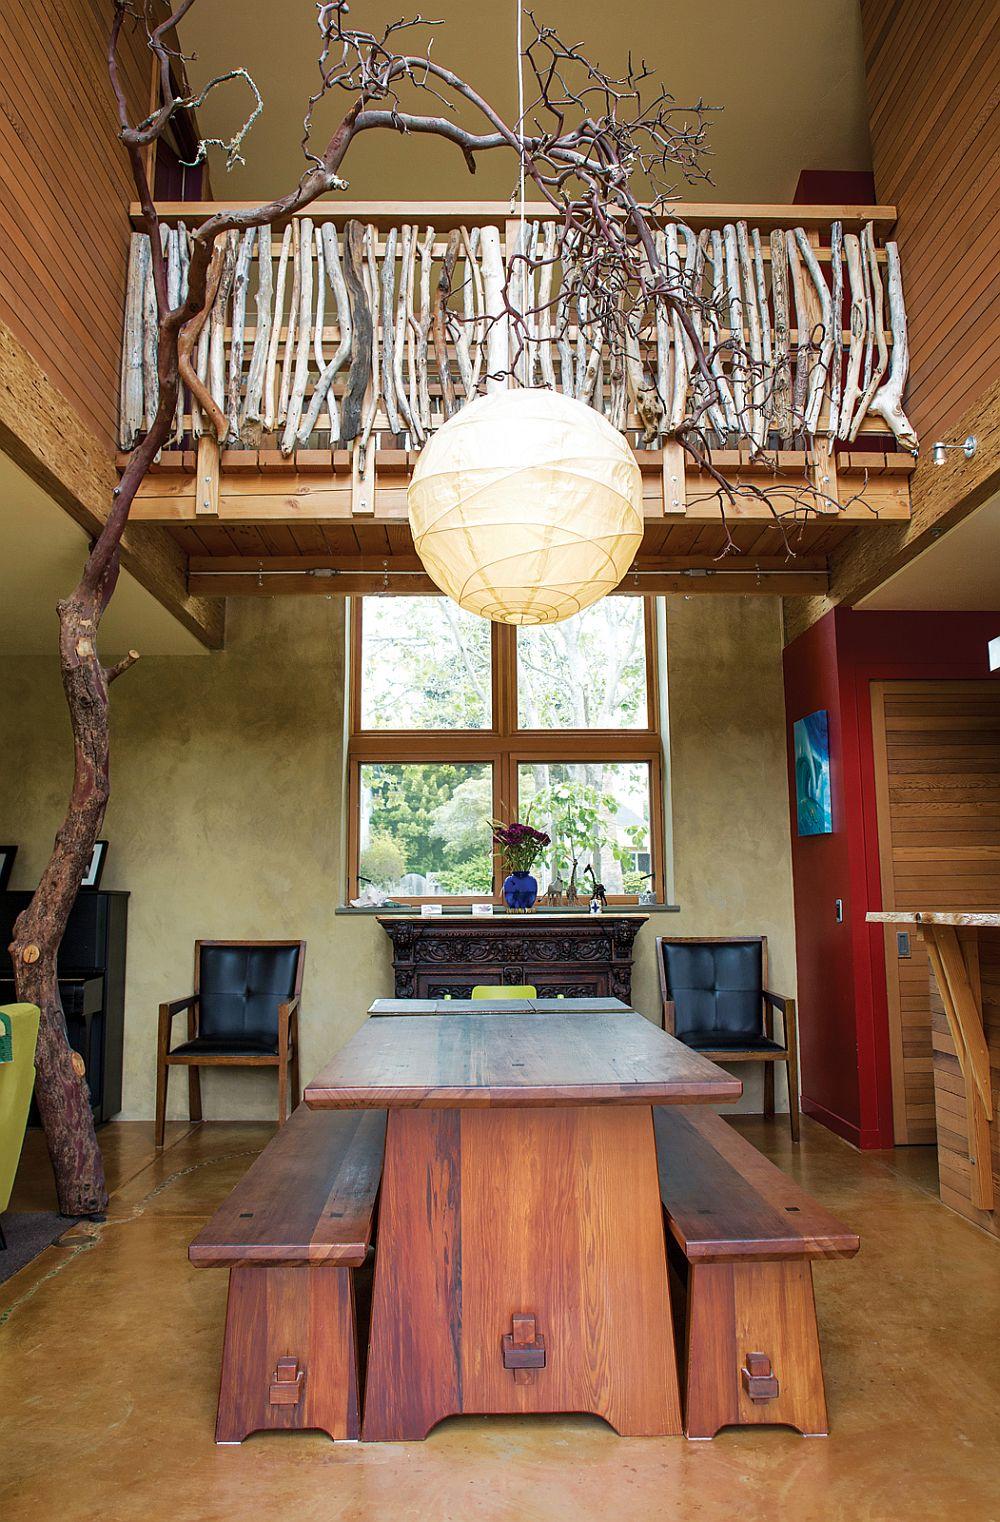 adelaparvu.com despre casa balori paie arh. Arkin Tilt Foto Gabriela Hasbun  (6)